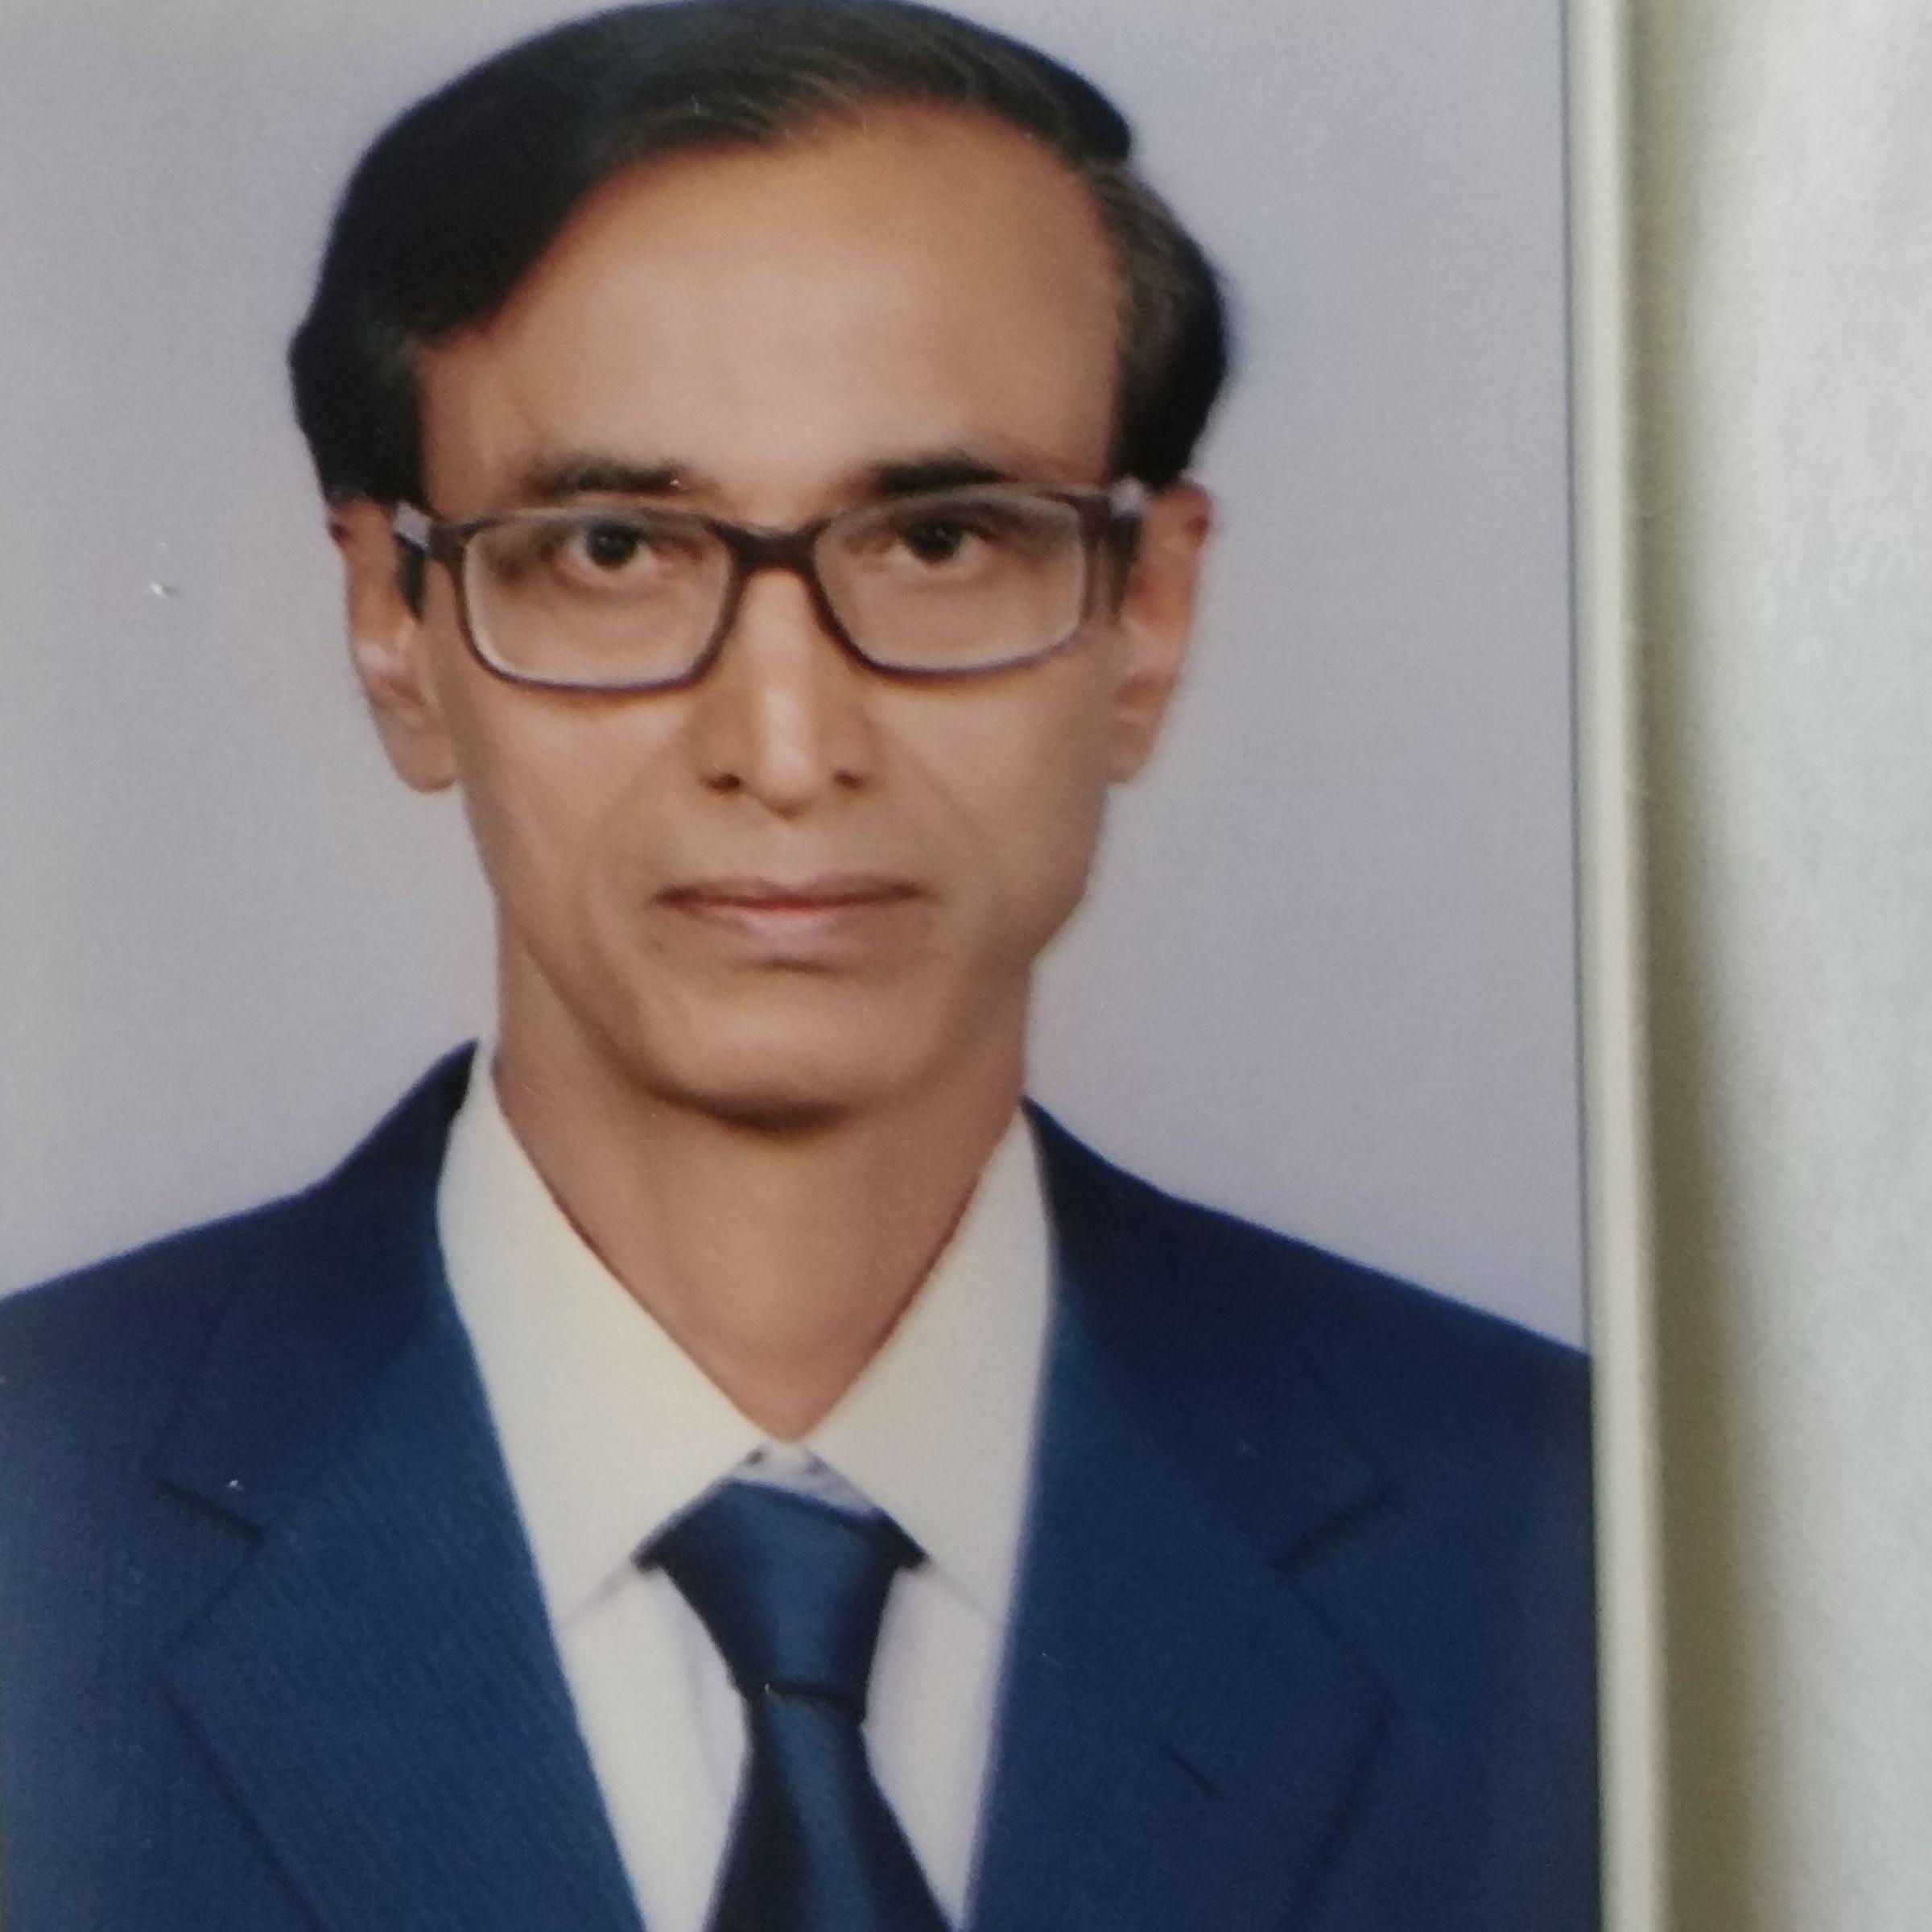 Dr Prof Shyamal Kumar Mukerjee .M.A,LL.M. D.Phil.(LAW). ALLAHABAD UNIVERSITY.mob 6306512320(WhatsApp) / 8005087640